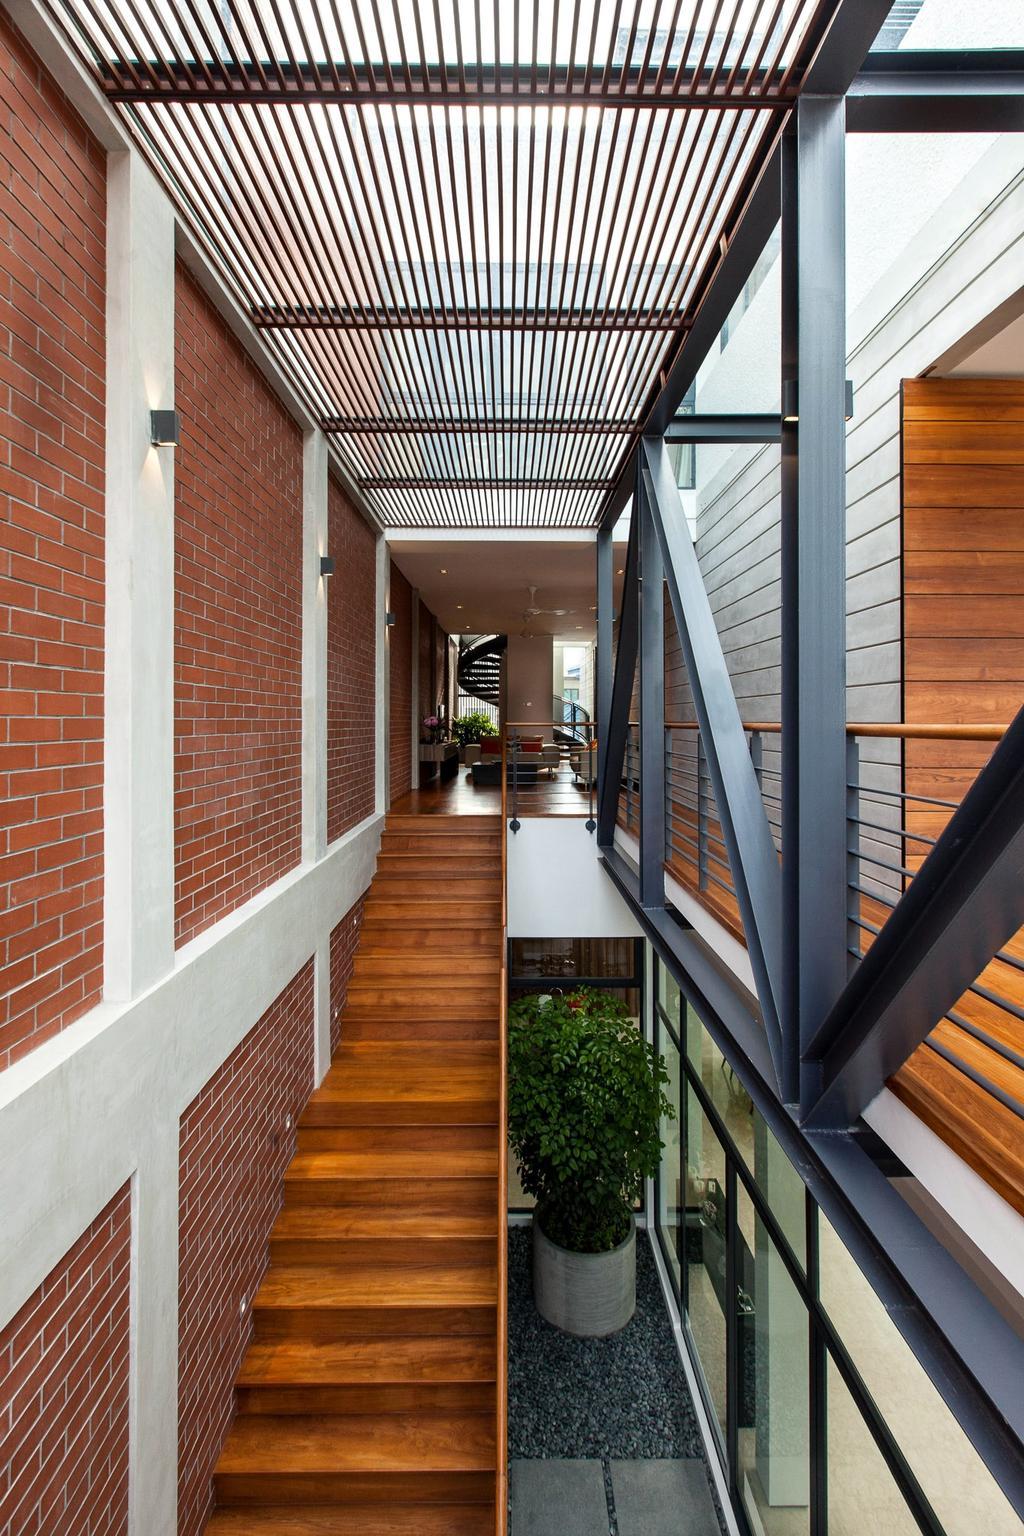 Contemporary, Landed, Jalan Remis, Architect, Aamer Architects, Railing, Porch, Building, House, Housing, Villa, HDB, Indoors, Loft